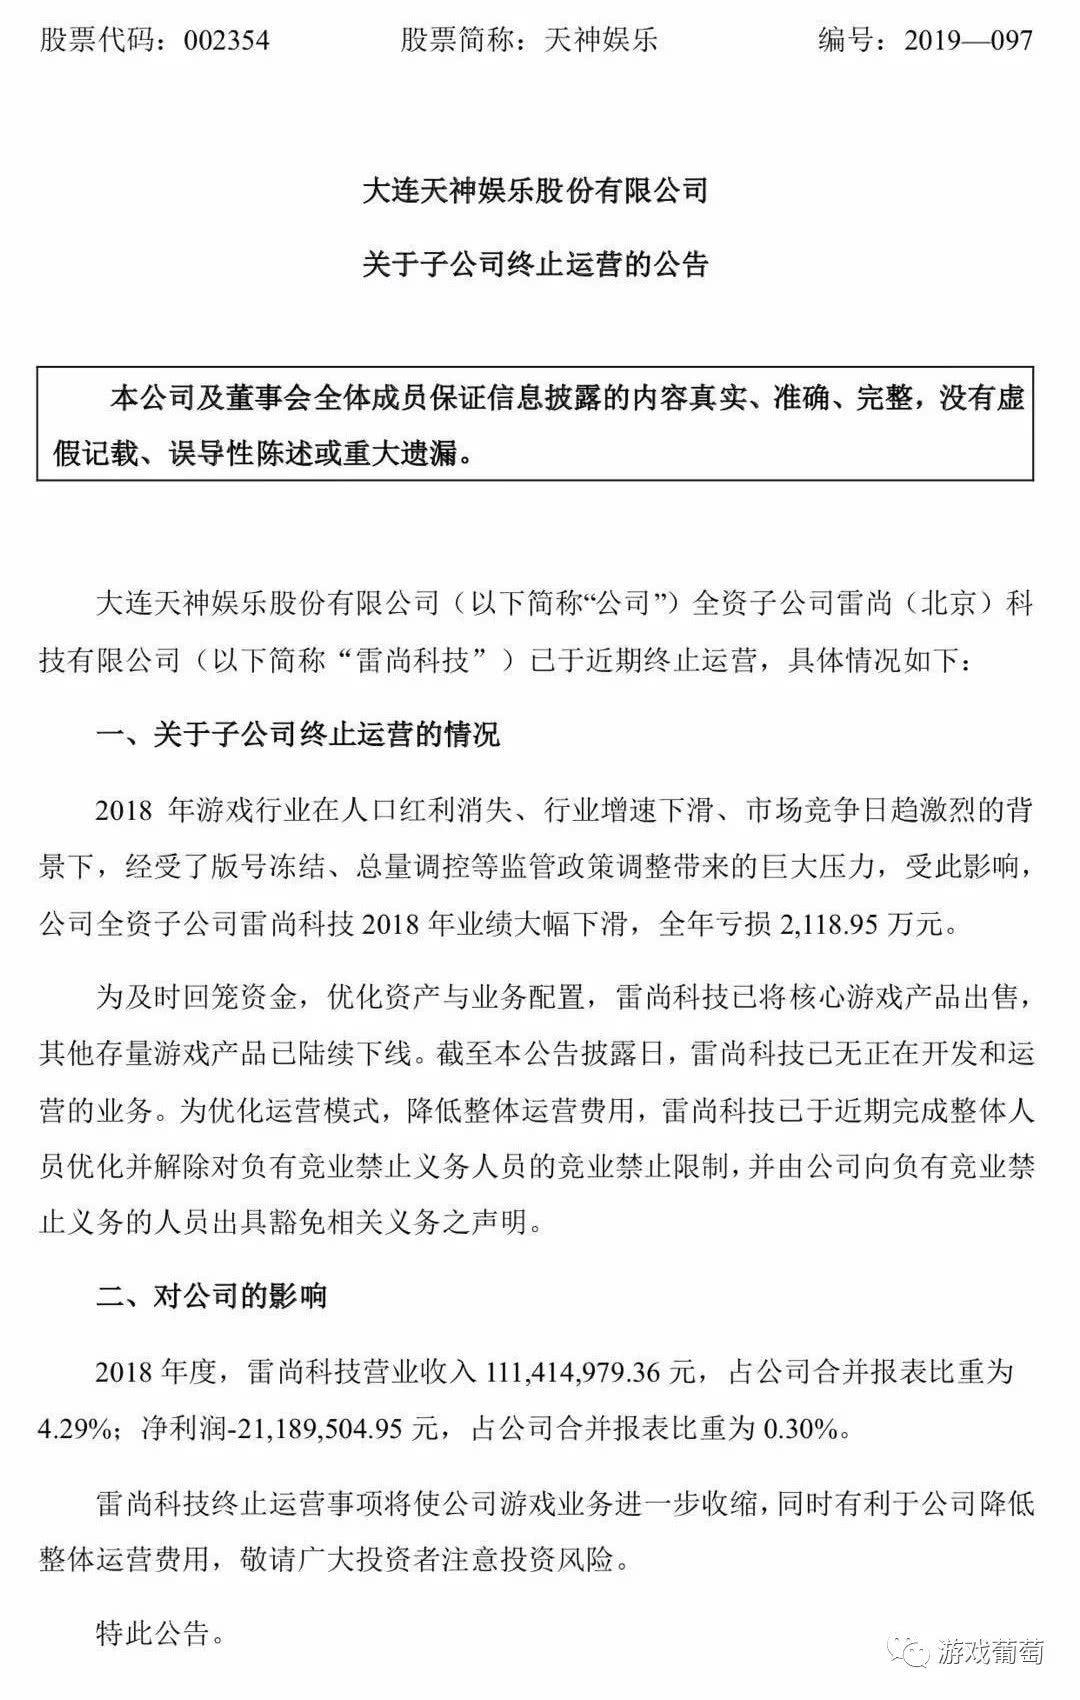 <b>天神娱乐子公司雷尚科技终止运营,后者2018年净亏损2118.95万元</b>